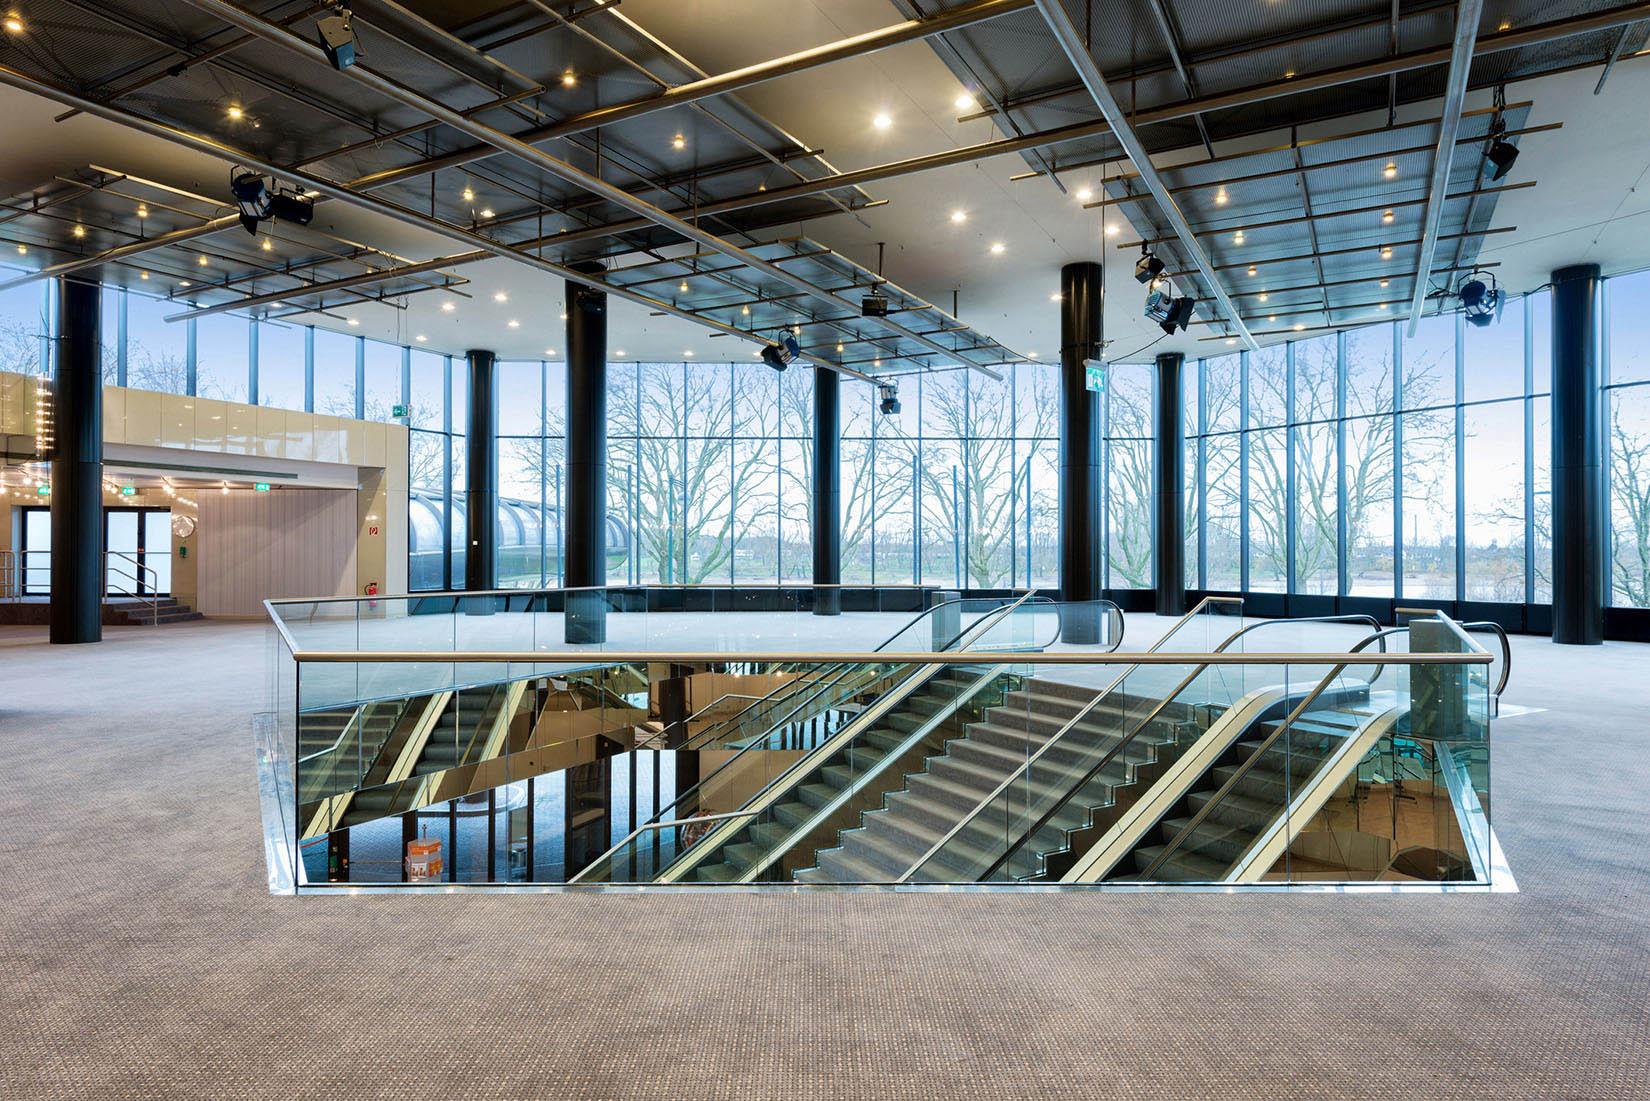 CCD Congress Center in Düsseldorf